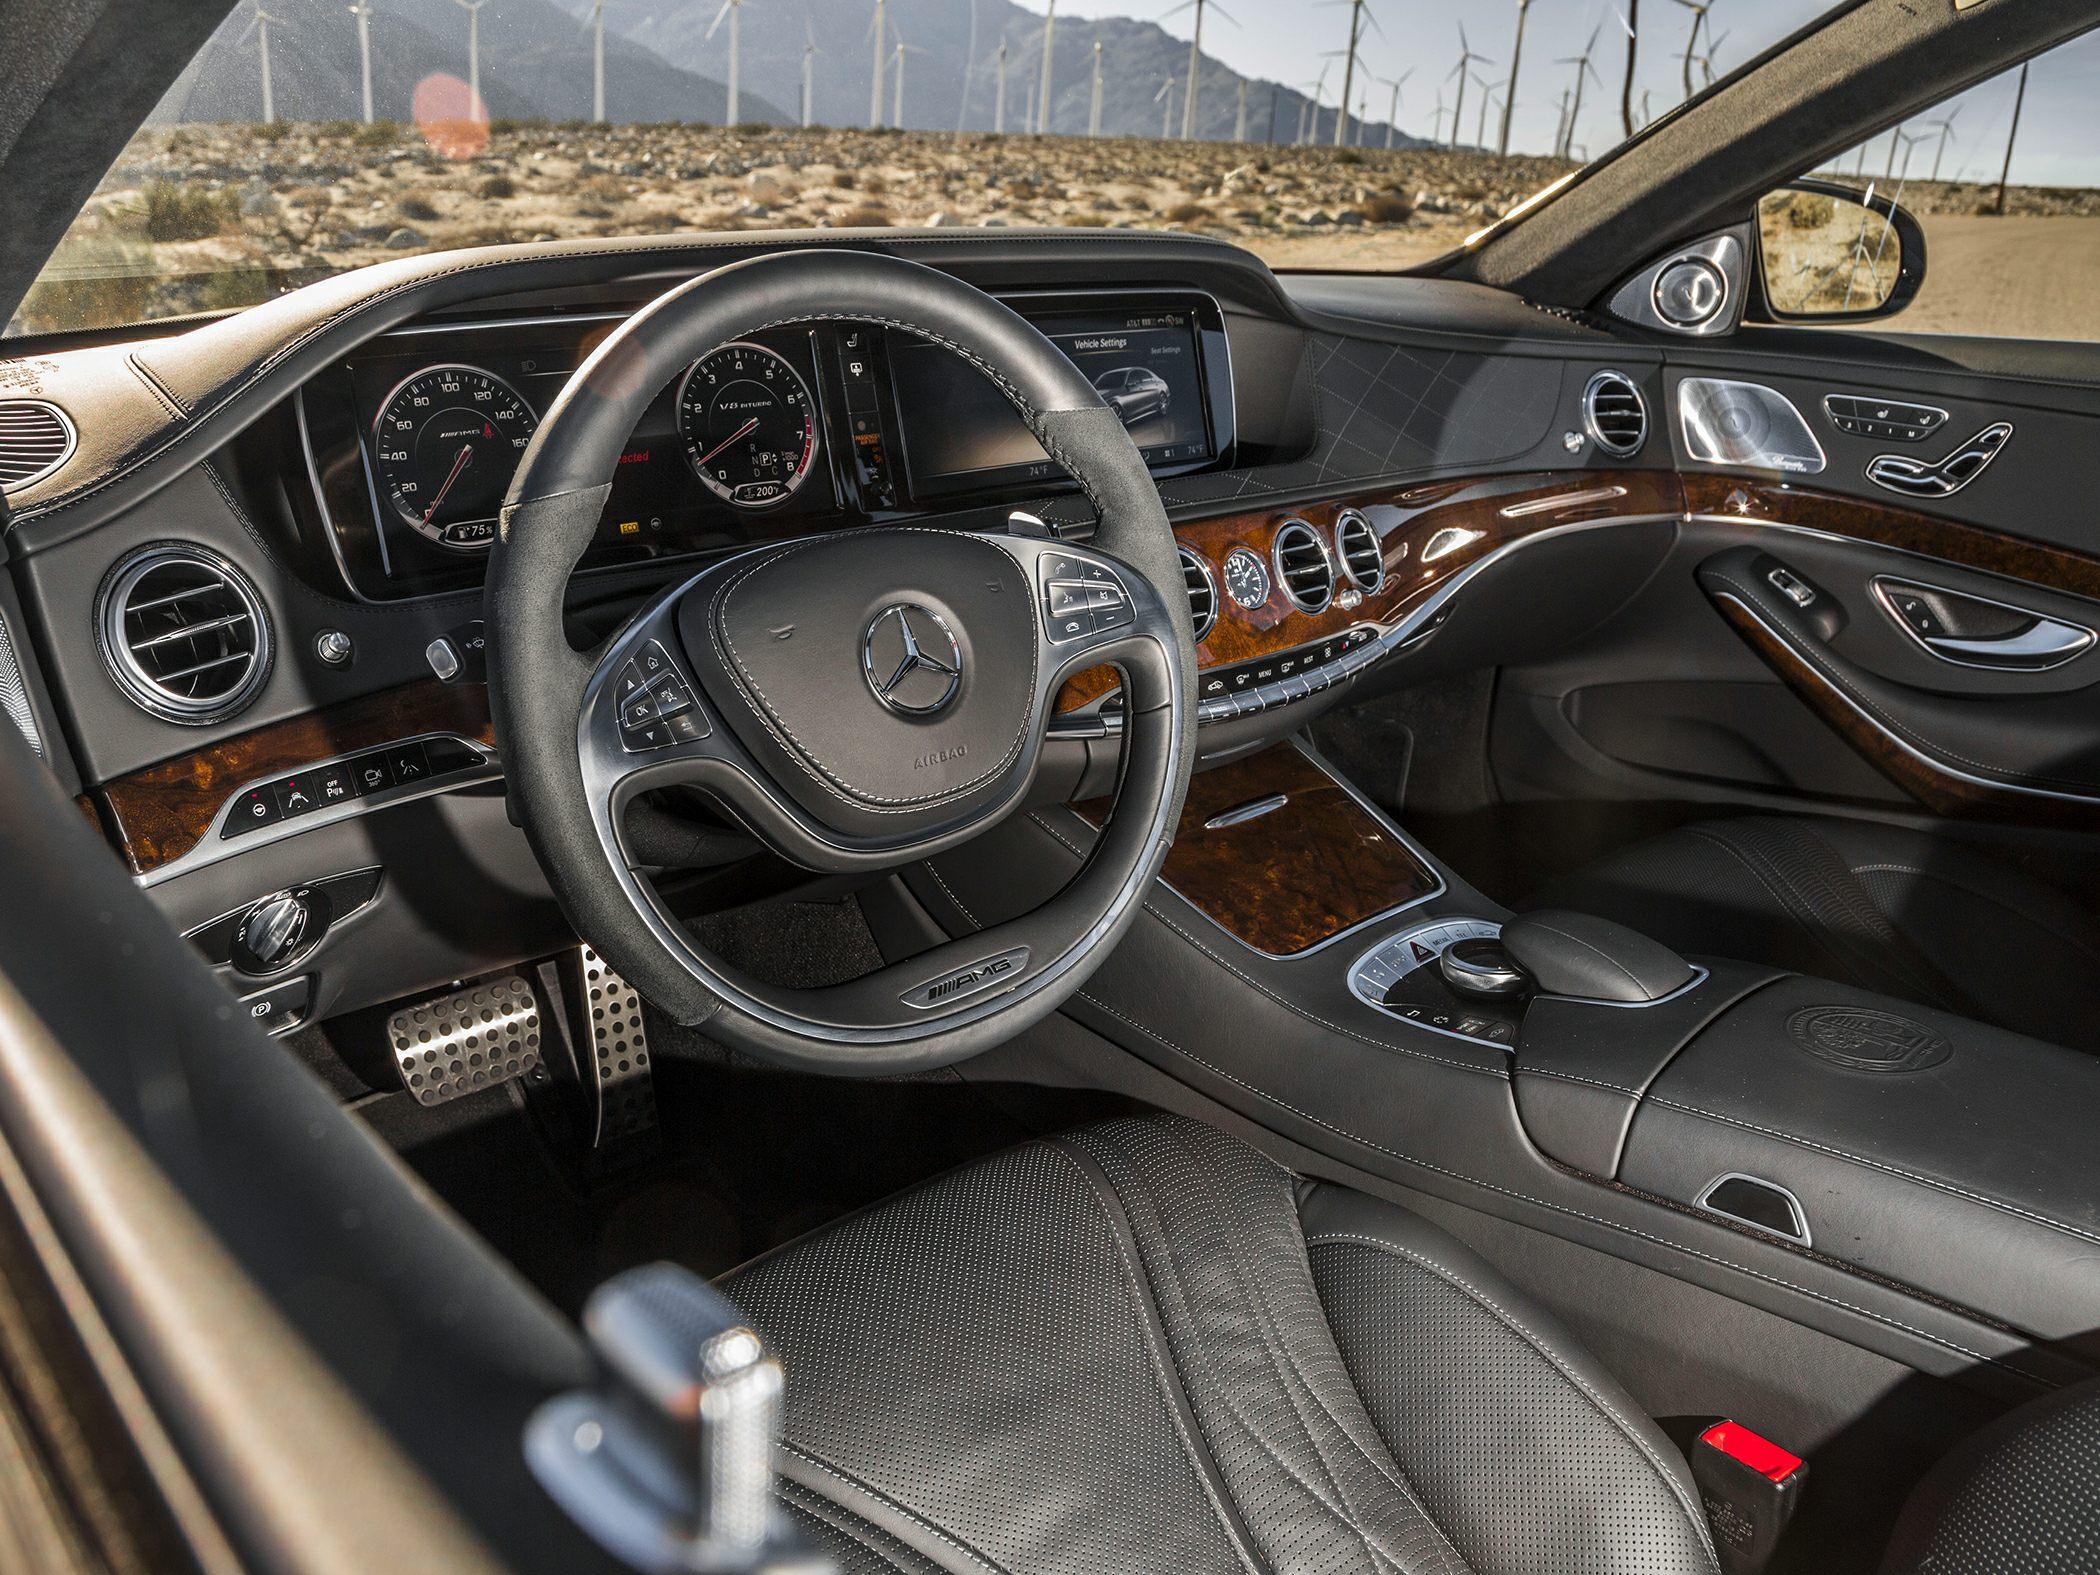 2015 Mercedes-Benz S63 AMG